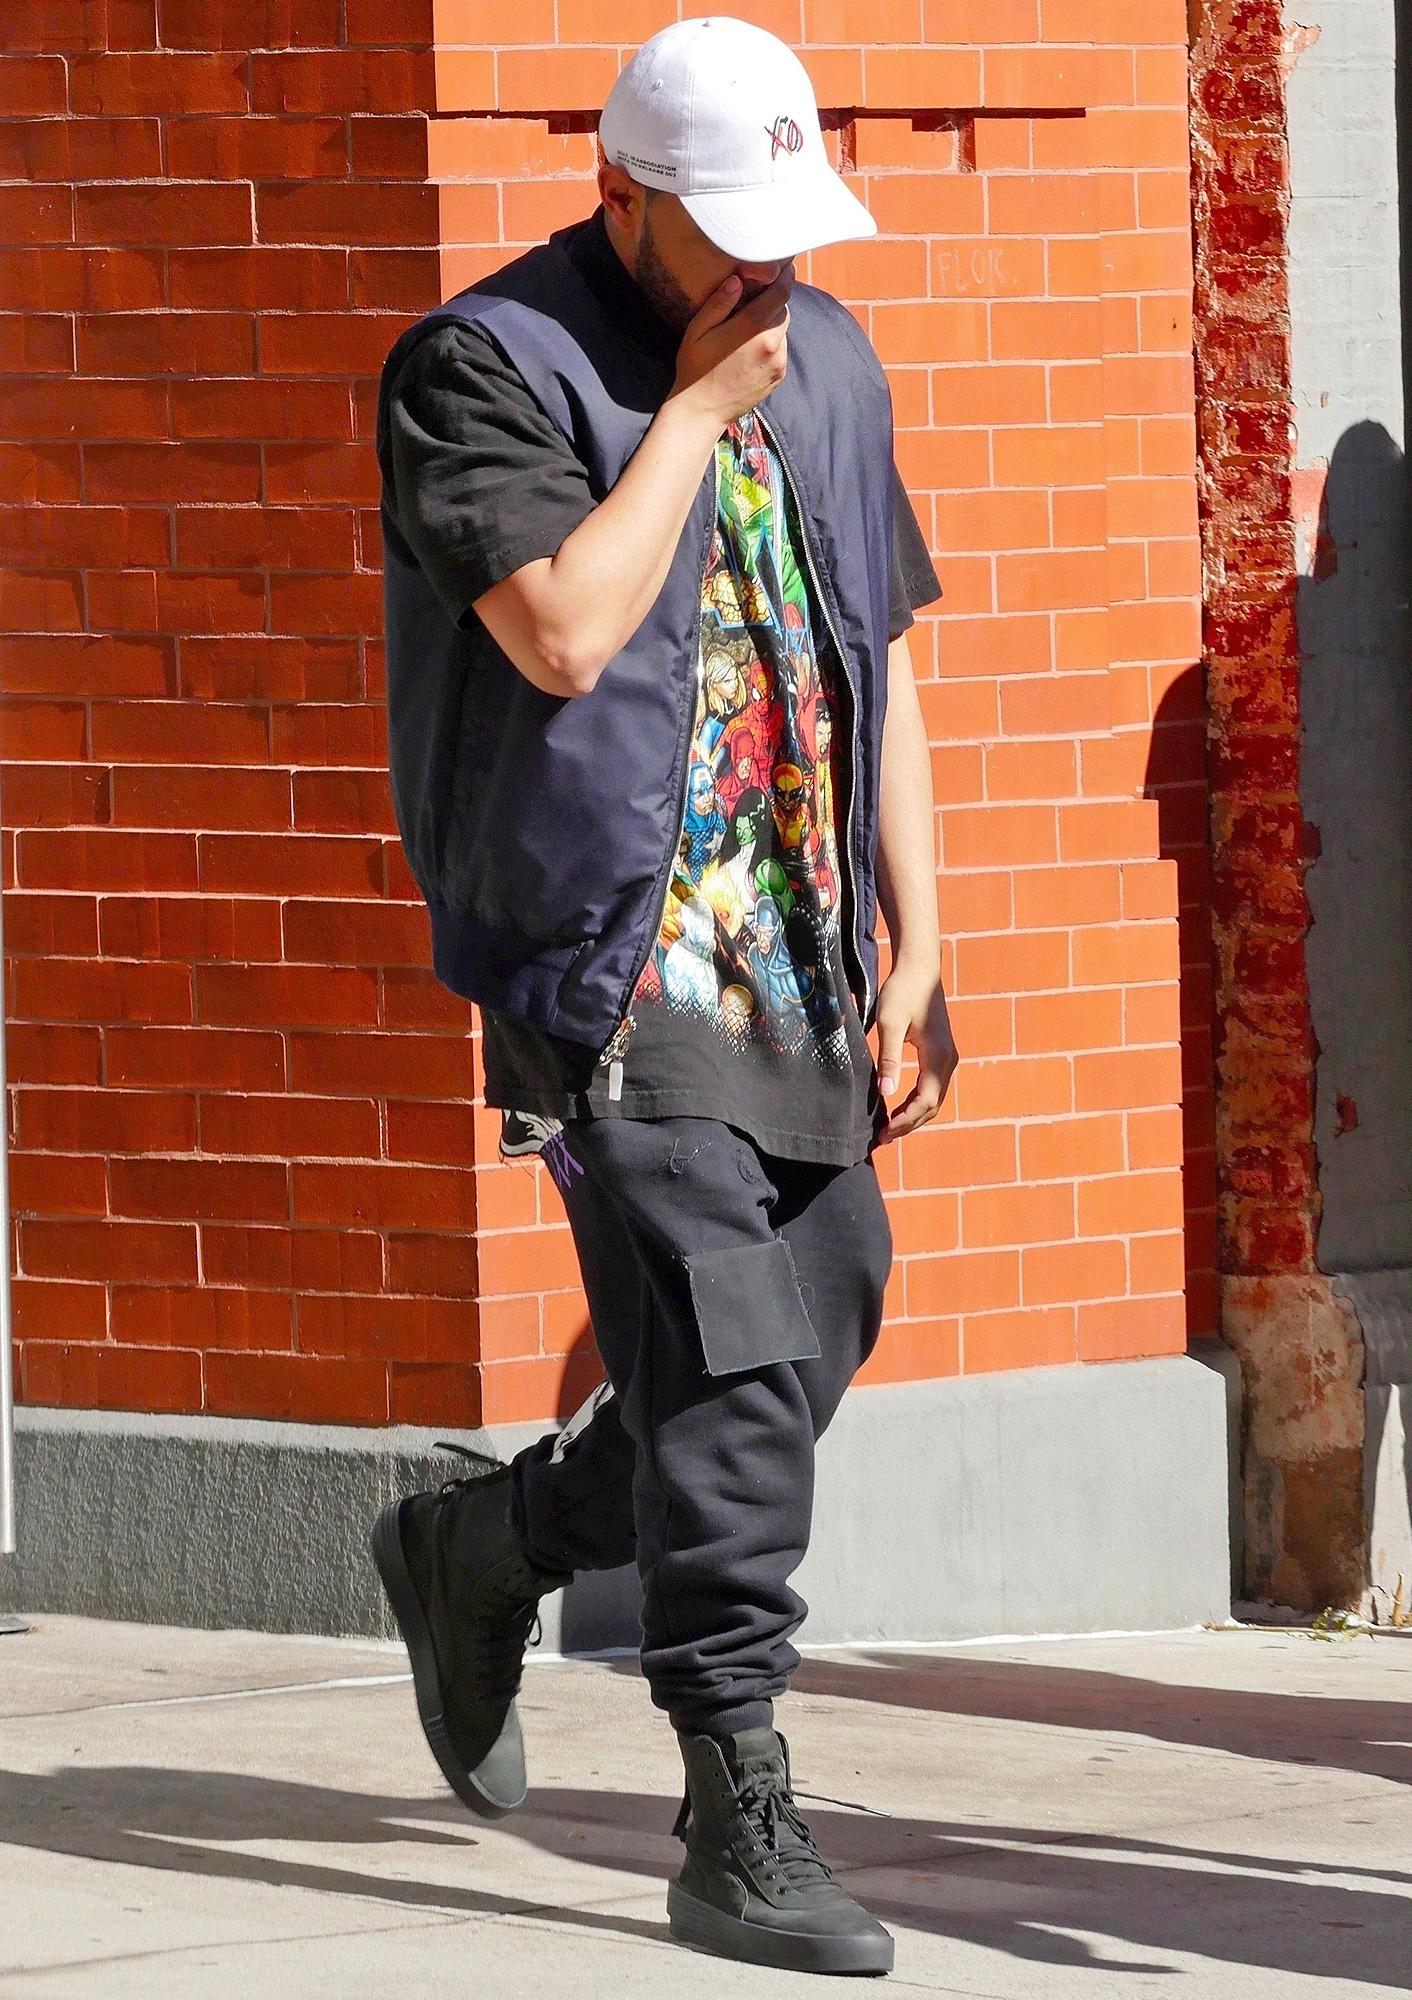 The Weeknd, Selena Gomez, Kidney, Surgery, New York City, Francia Raisa